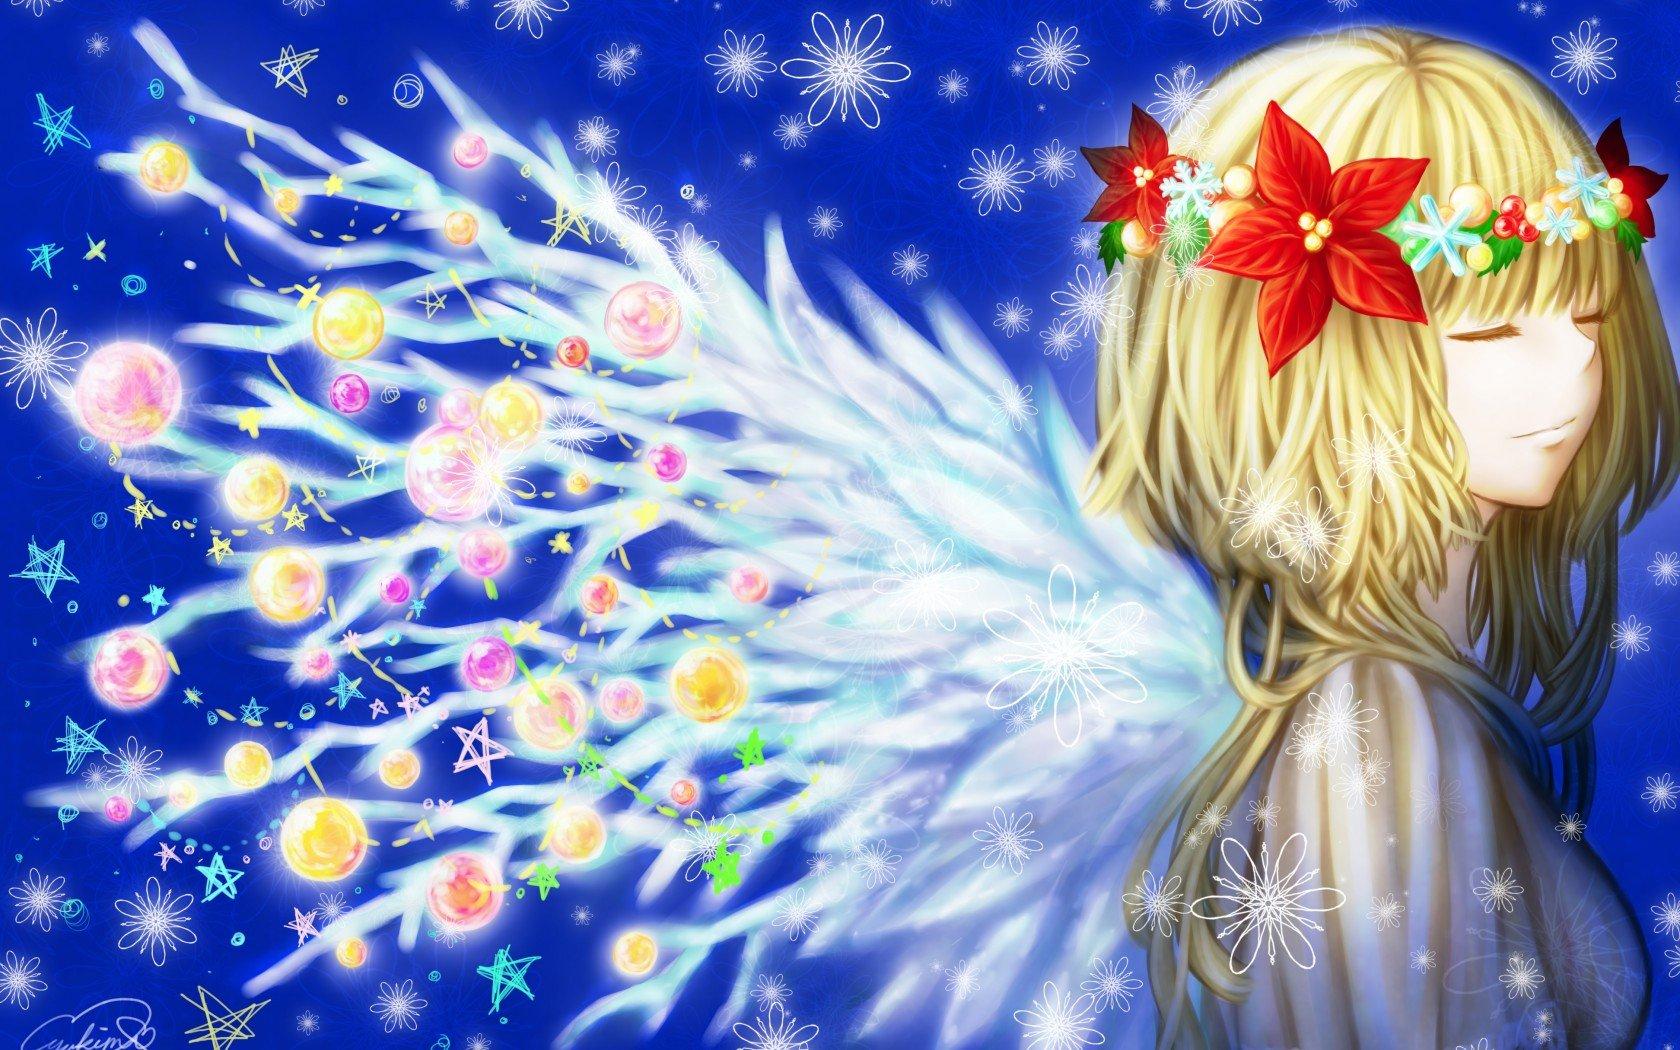 Faerie Girl Wallpaper Girl Toys Anime Christmas New Year Winter Wreath Wings